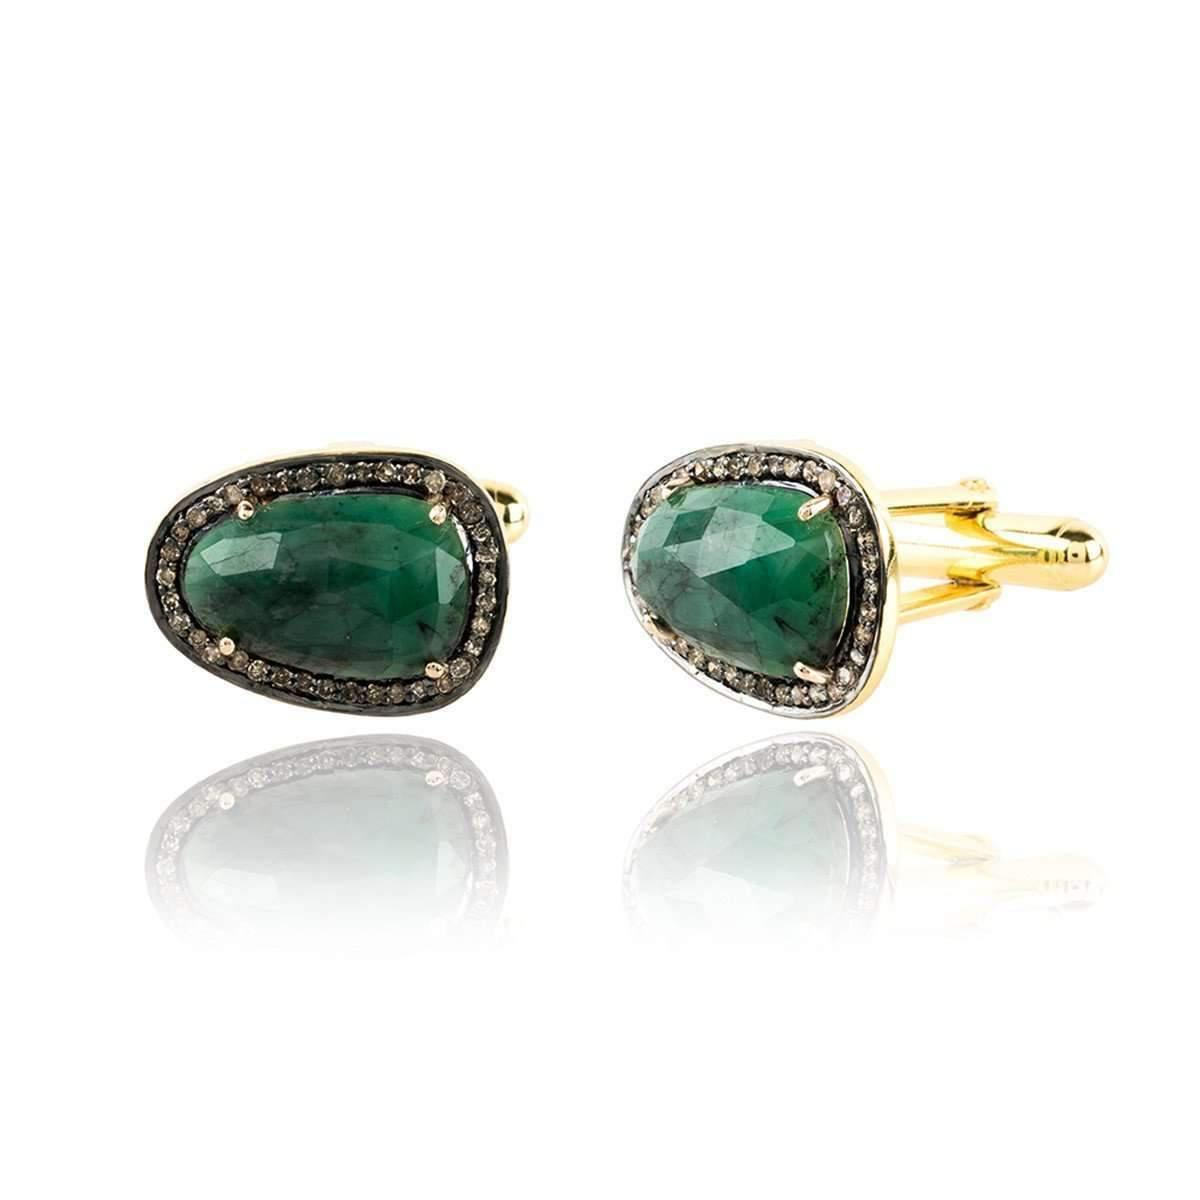 Latelita London Emerald Cufflink Gold With Diamonds VrxUrq3mC